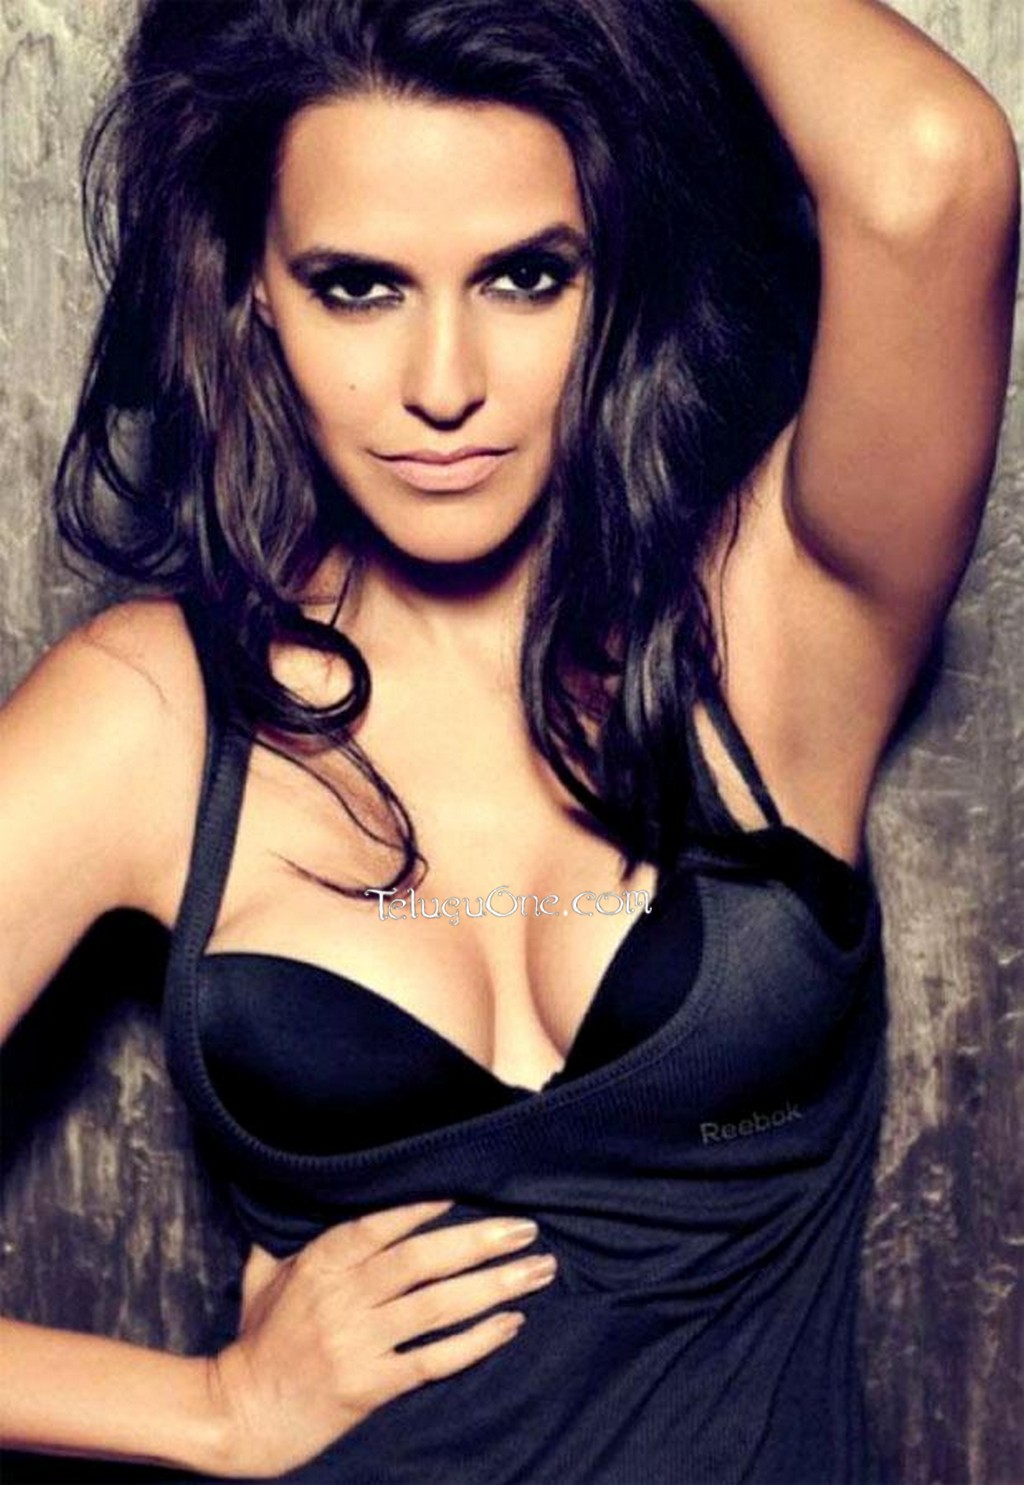 Bollywood Pics Pix4World Neha Dhupia Hot And Sexy Hd -3951